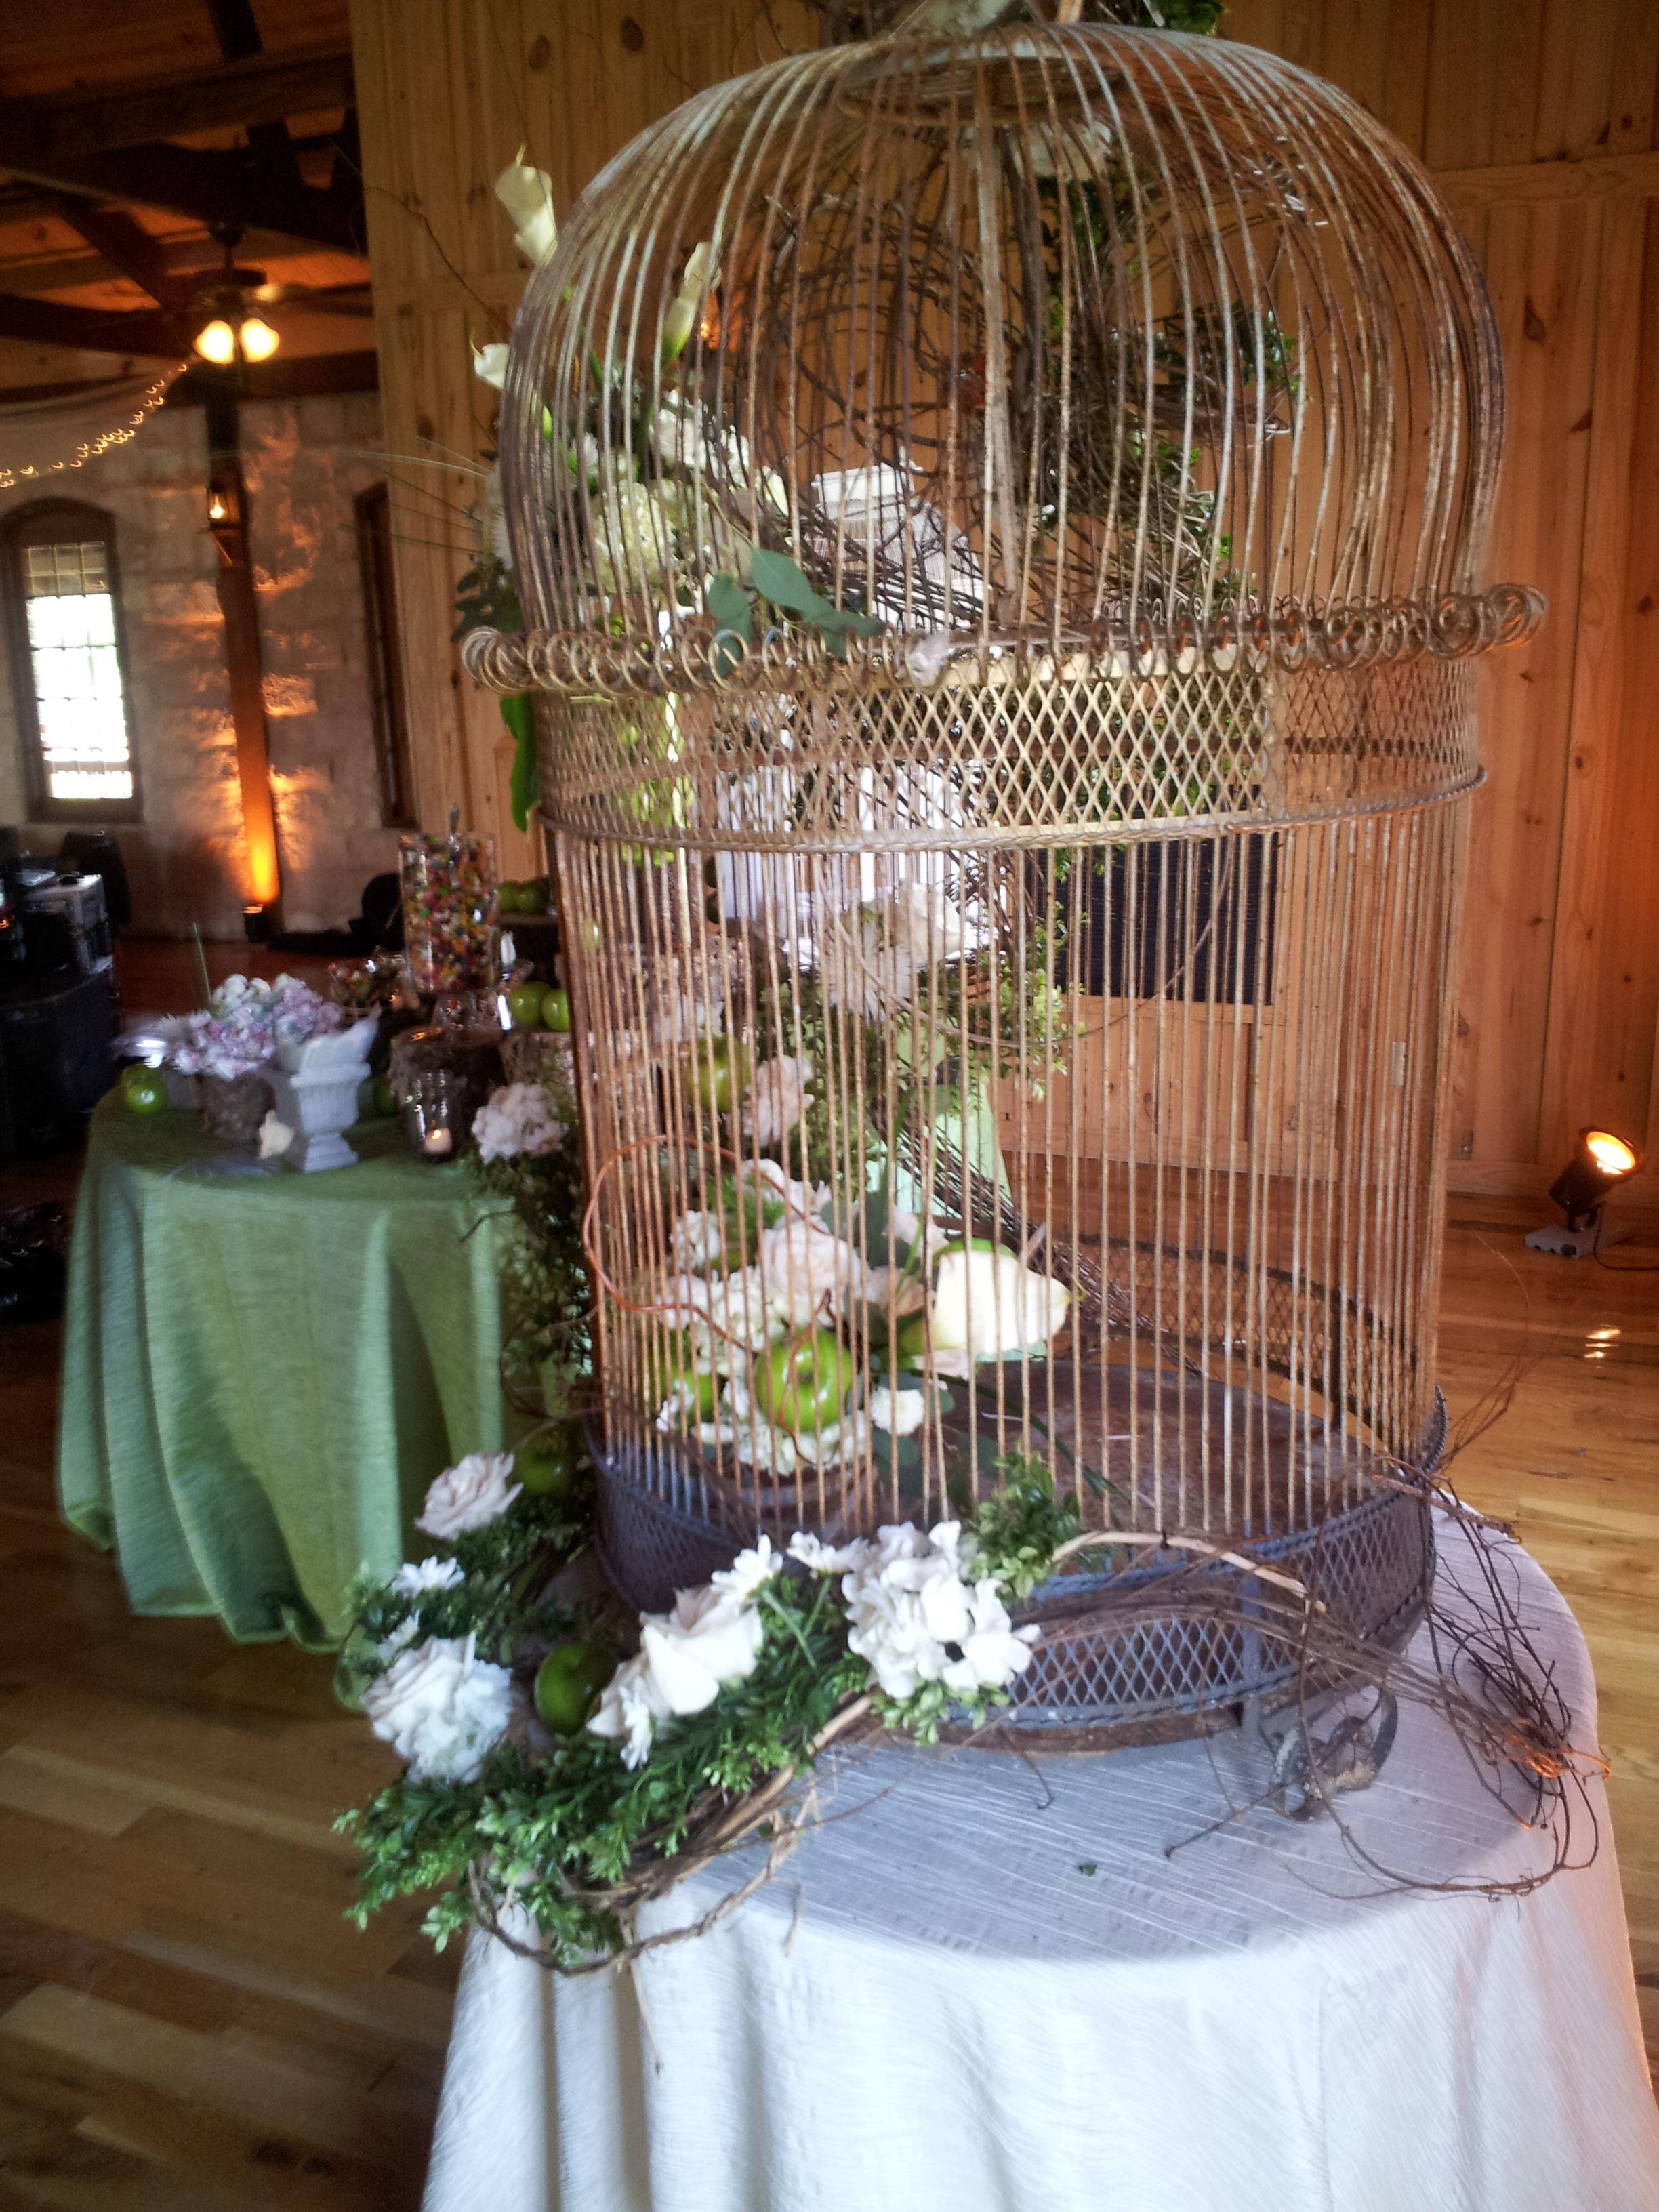 Bird Cage Decor at Boulder Spring Wedding. Decor by Chic Concepts